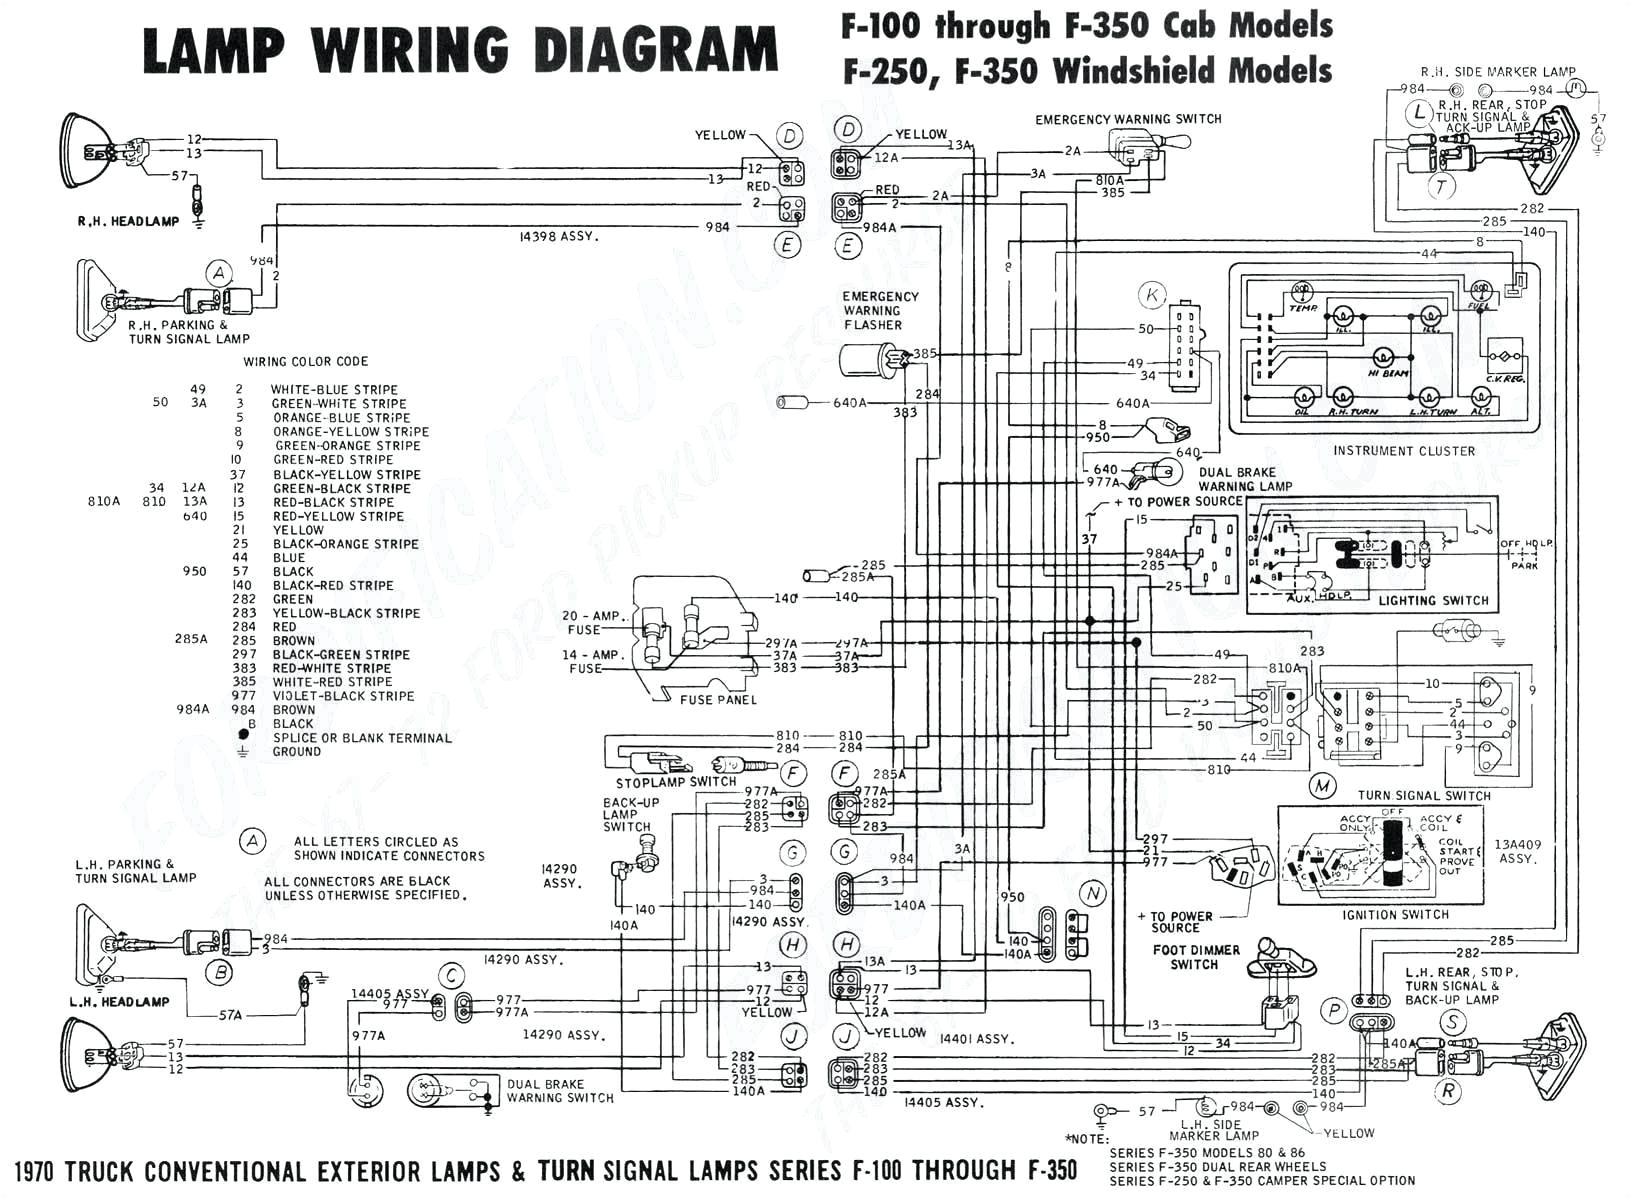 2002 toyota Sienna Radio Wiring Diagram Ethernet End Wiring Diagram Wiring Library